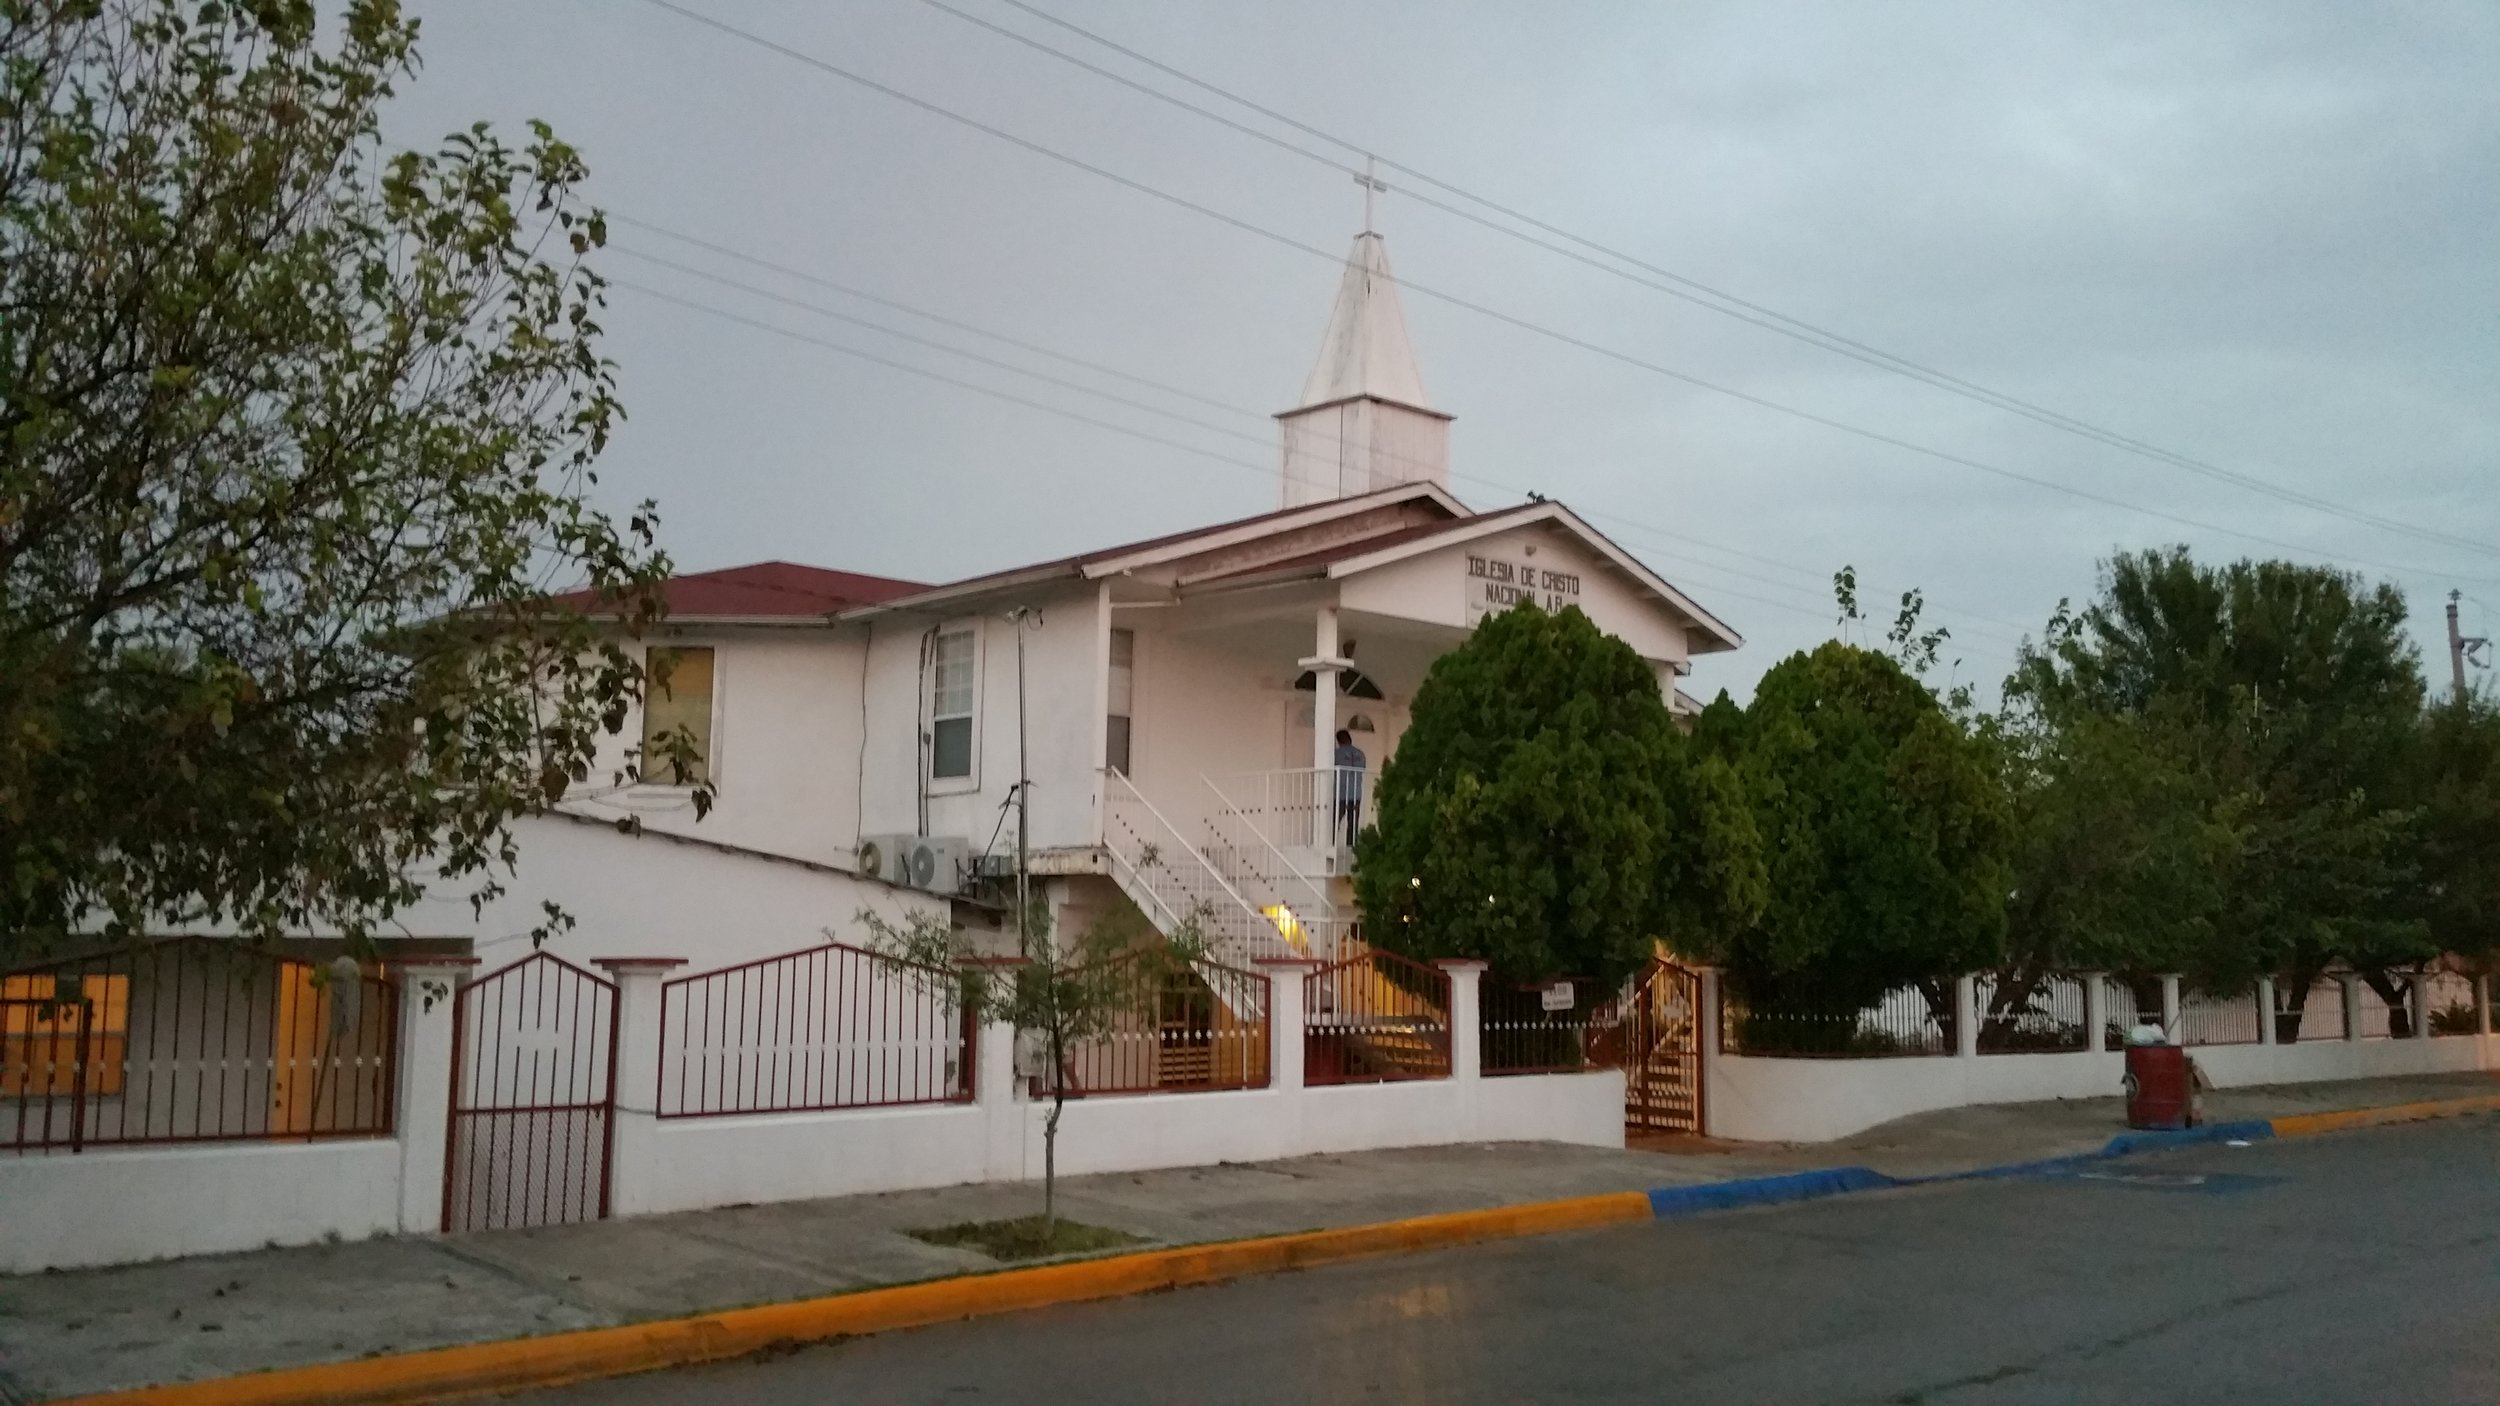 mexico missions trip valley view dallas